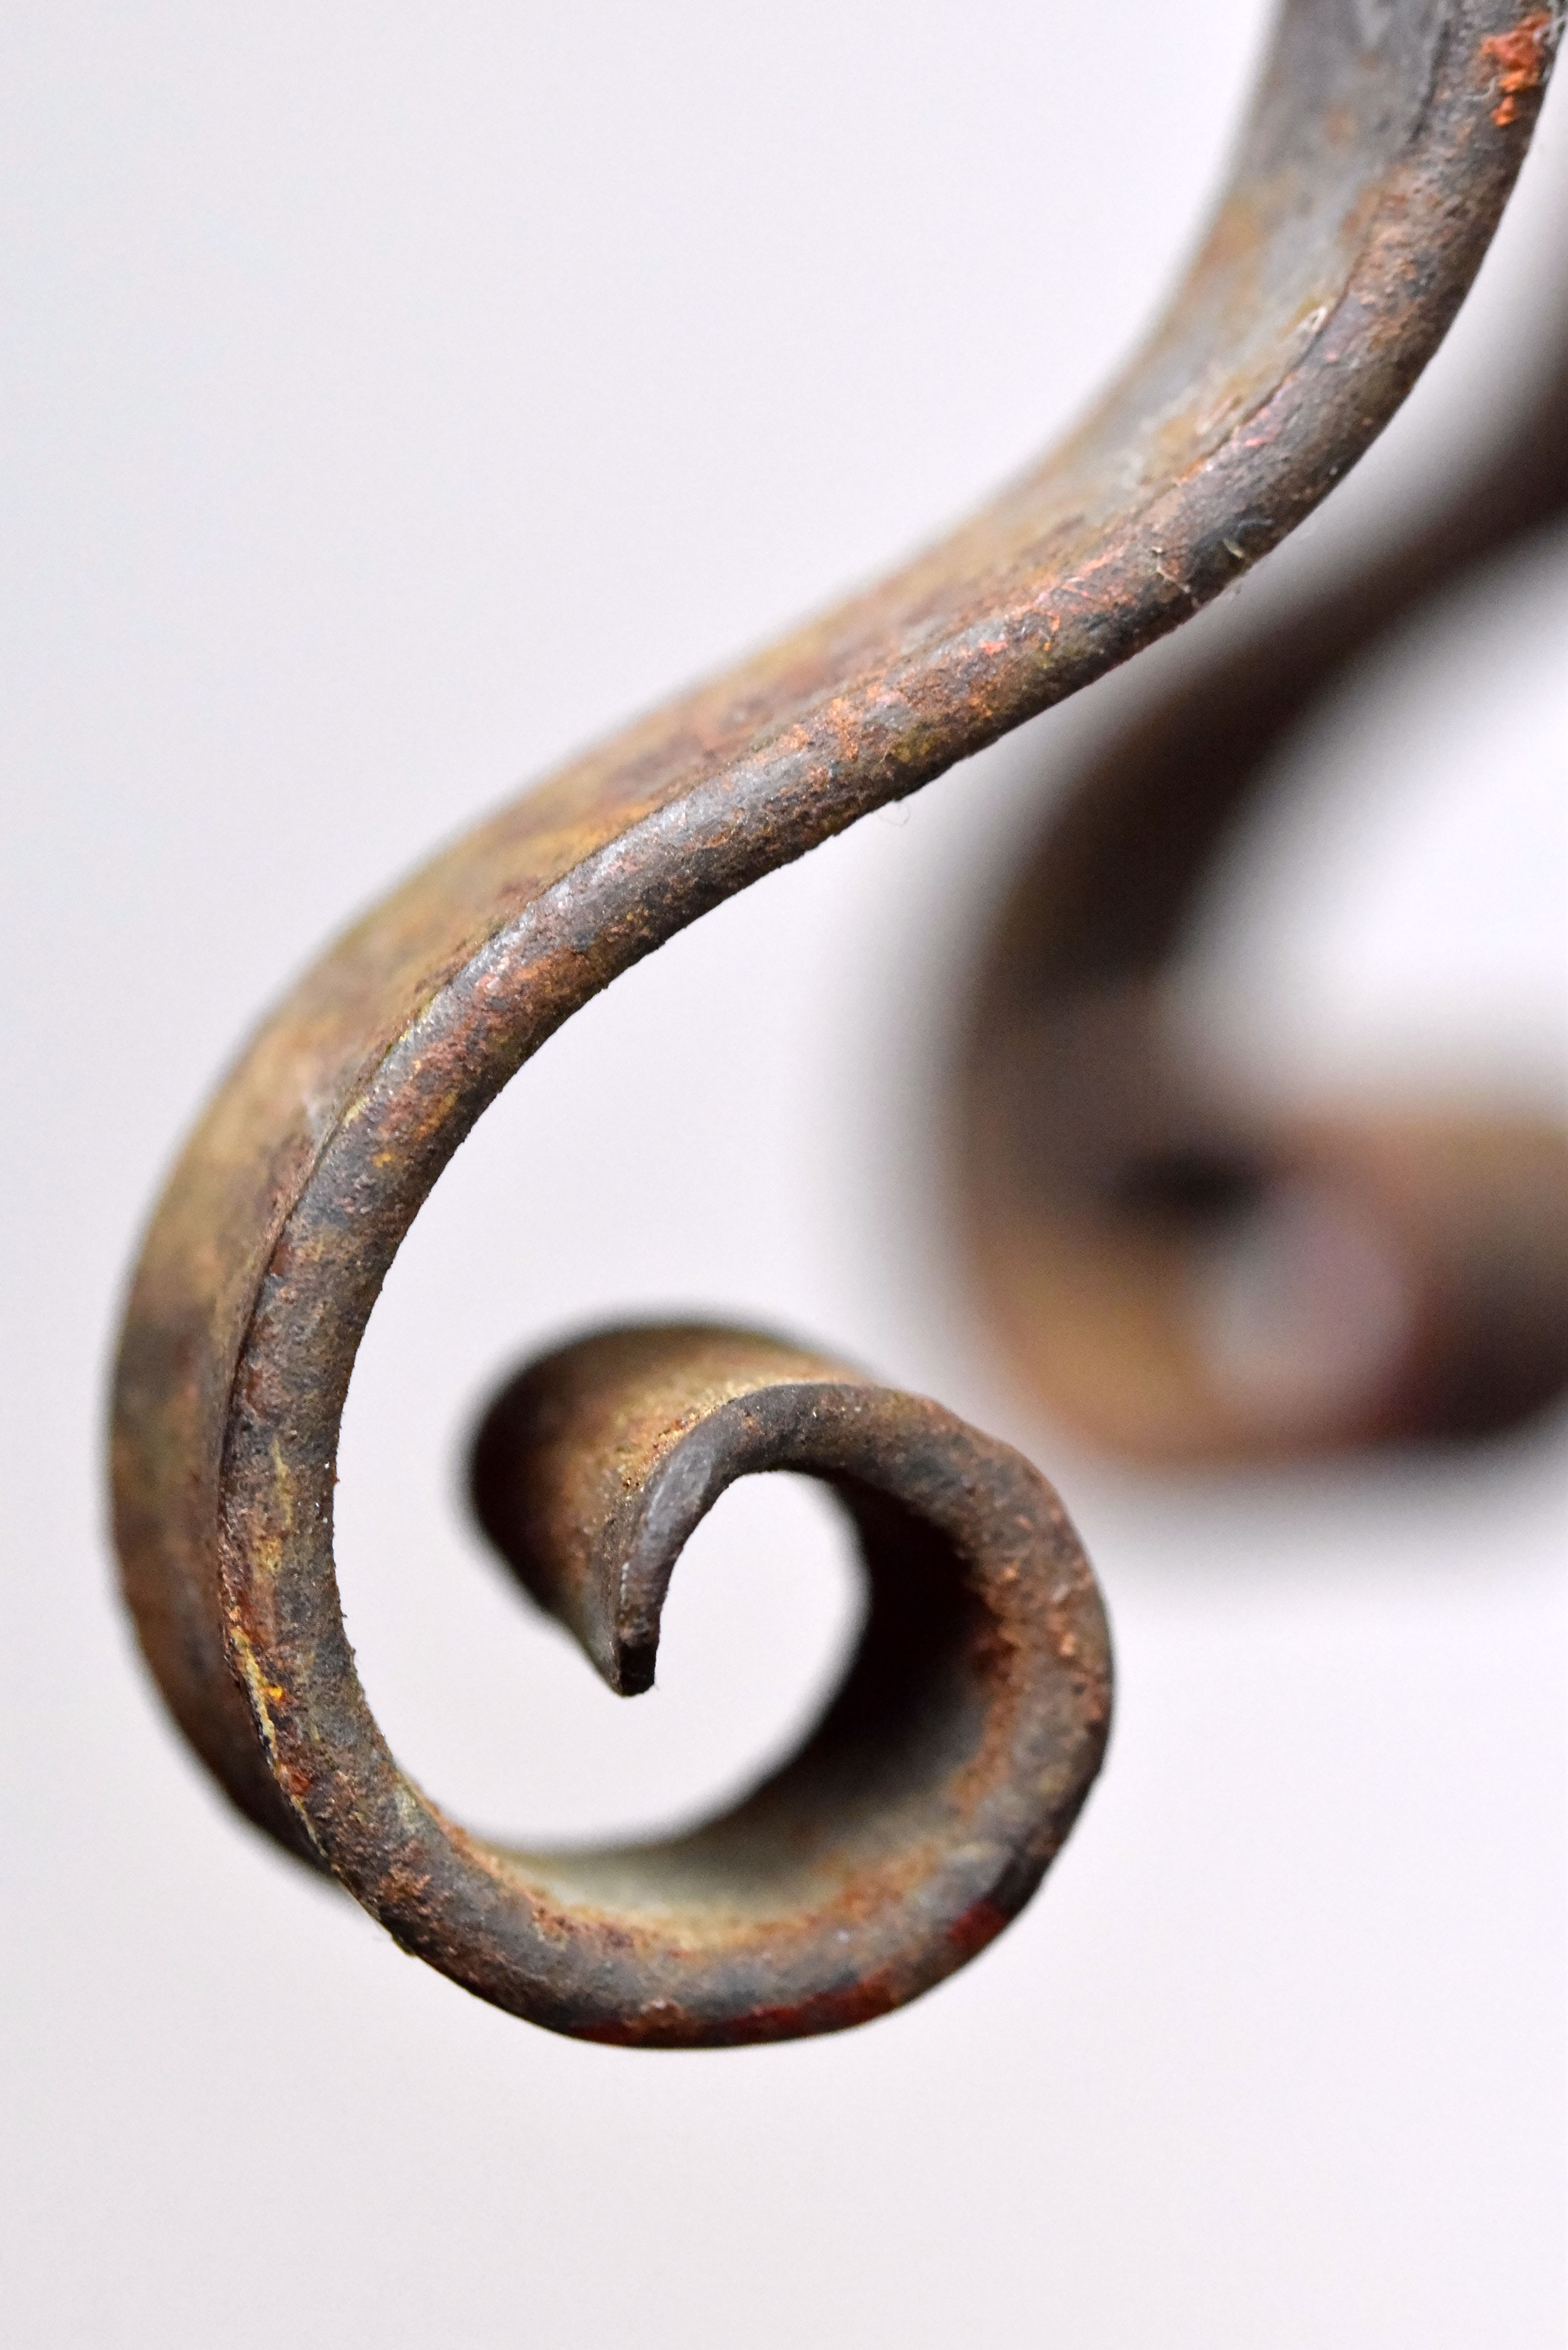 47444-painted-iron-pendant-macro.jpg